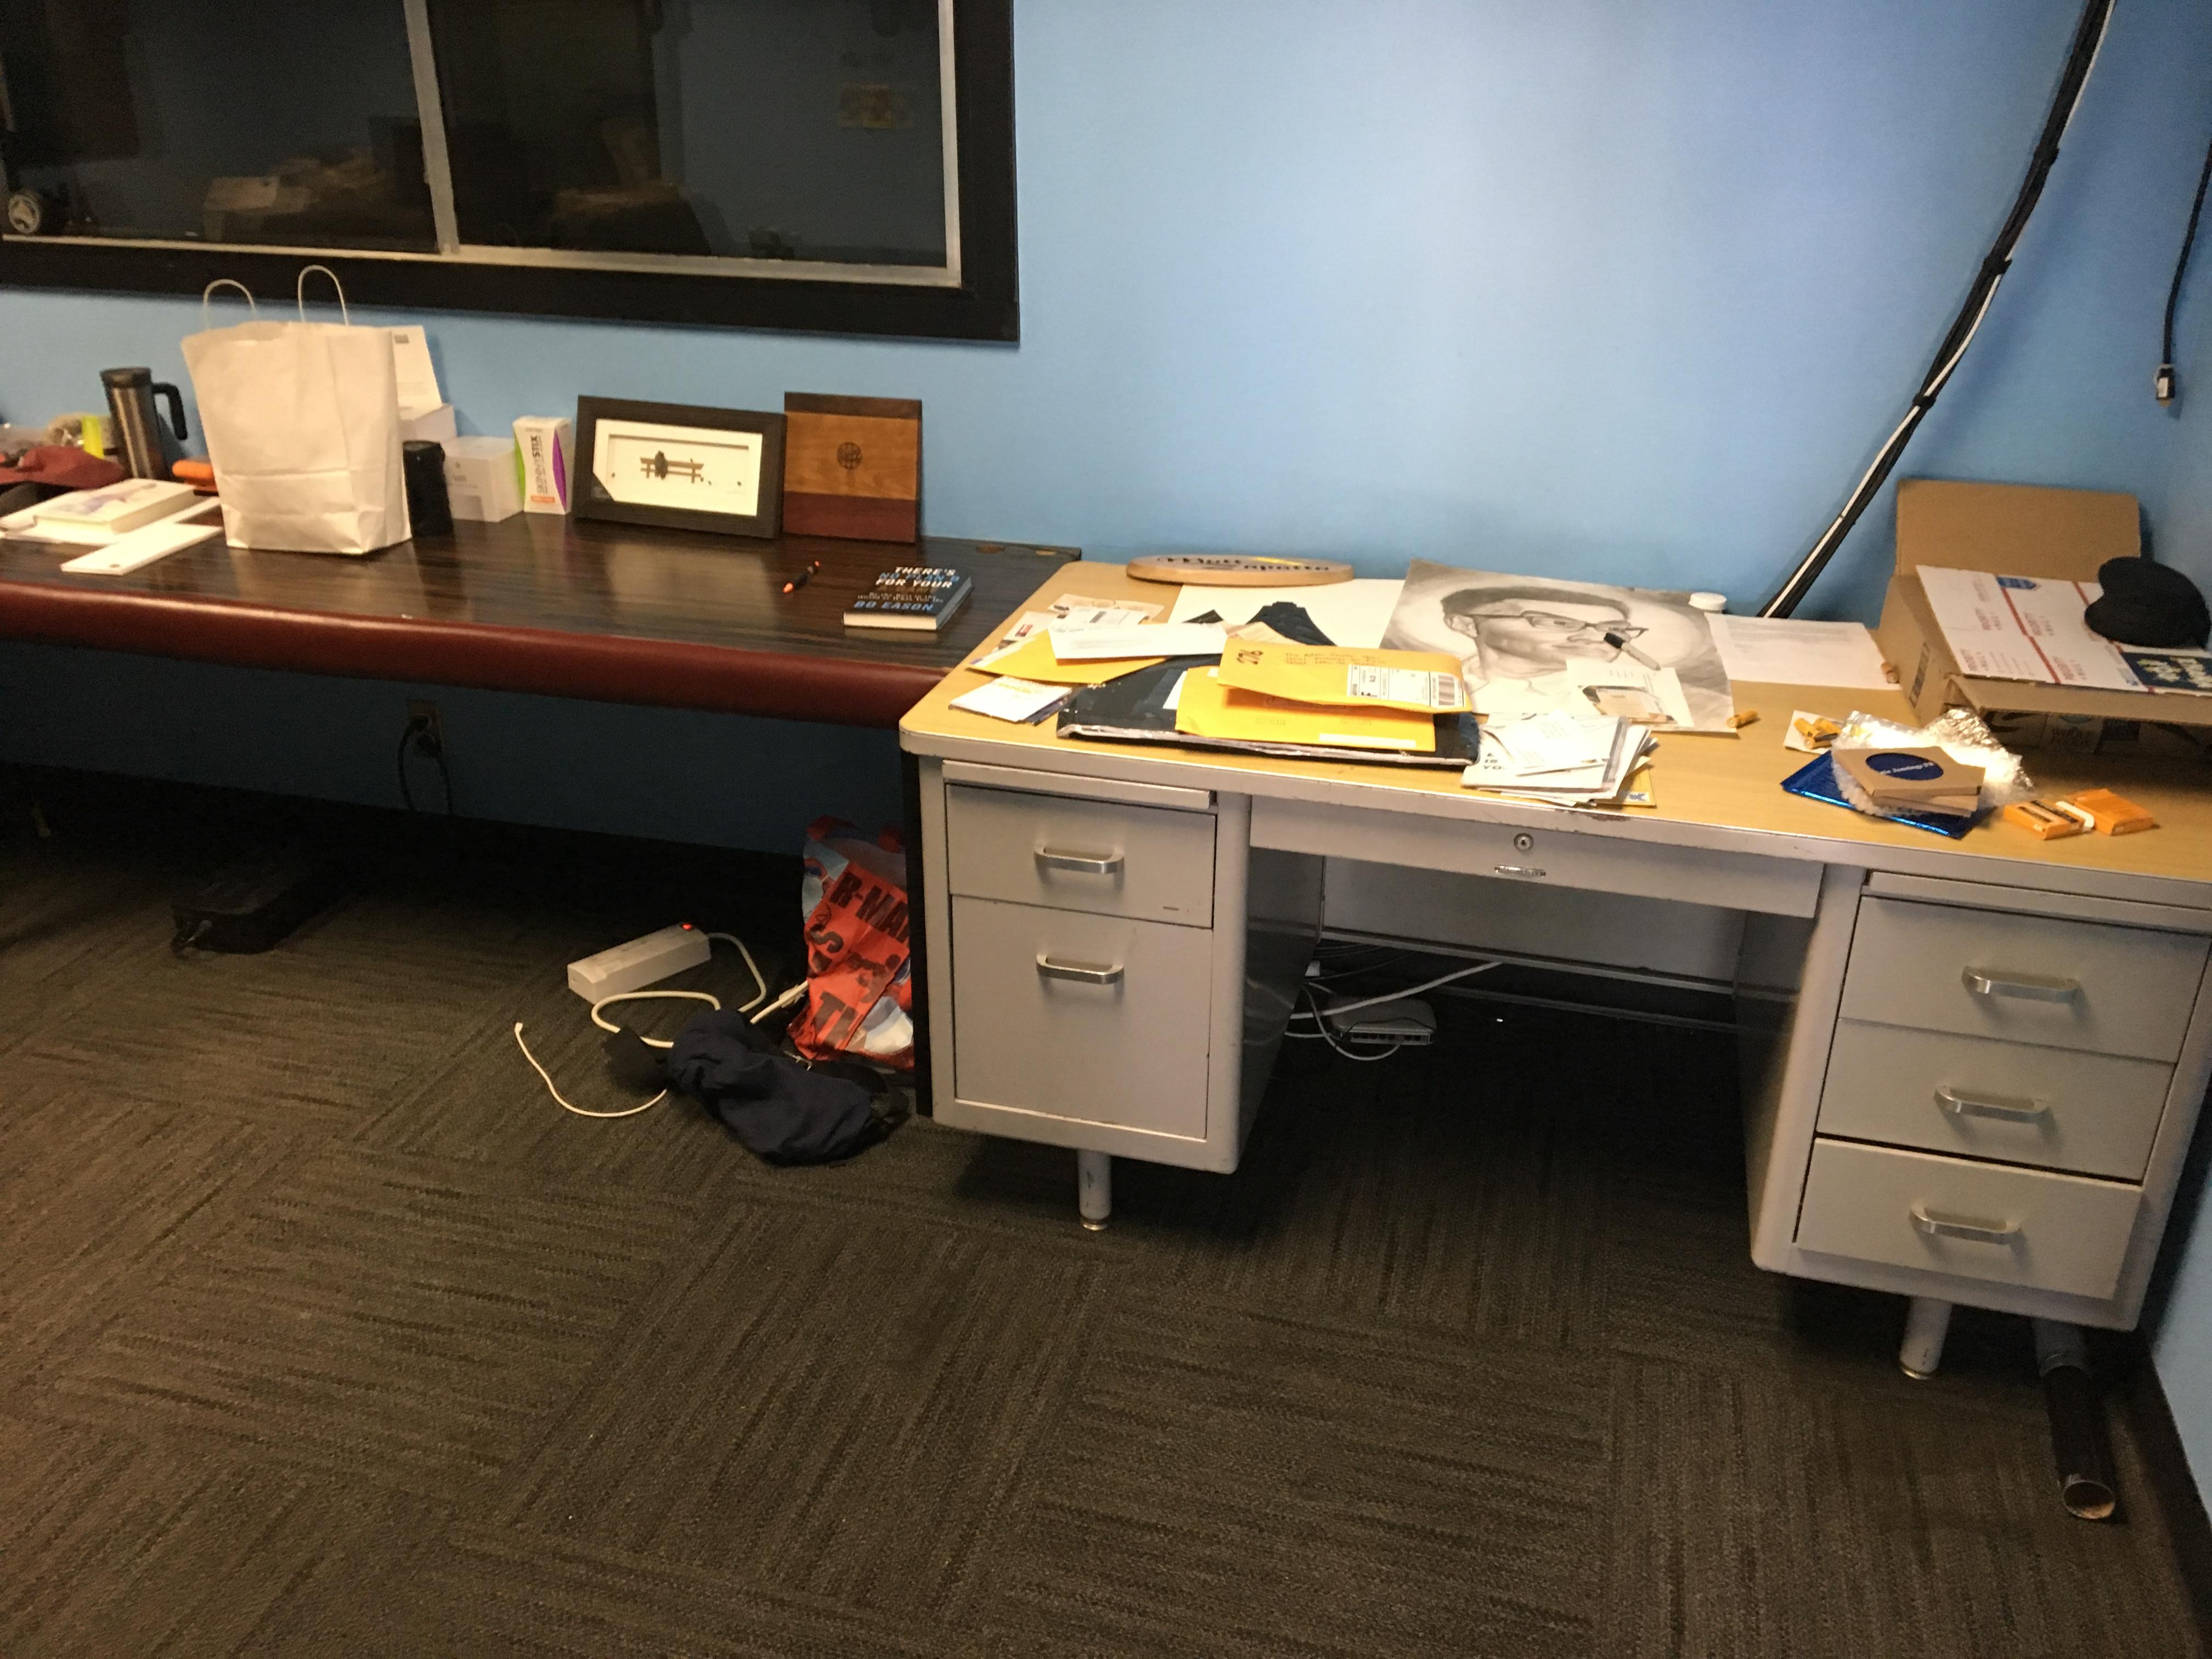 02-Unorganized-Office-2